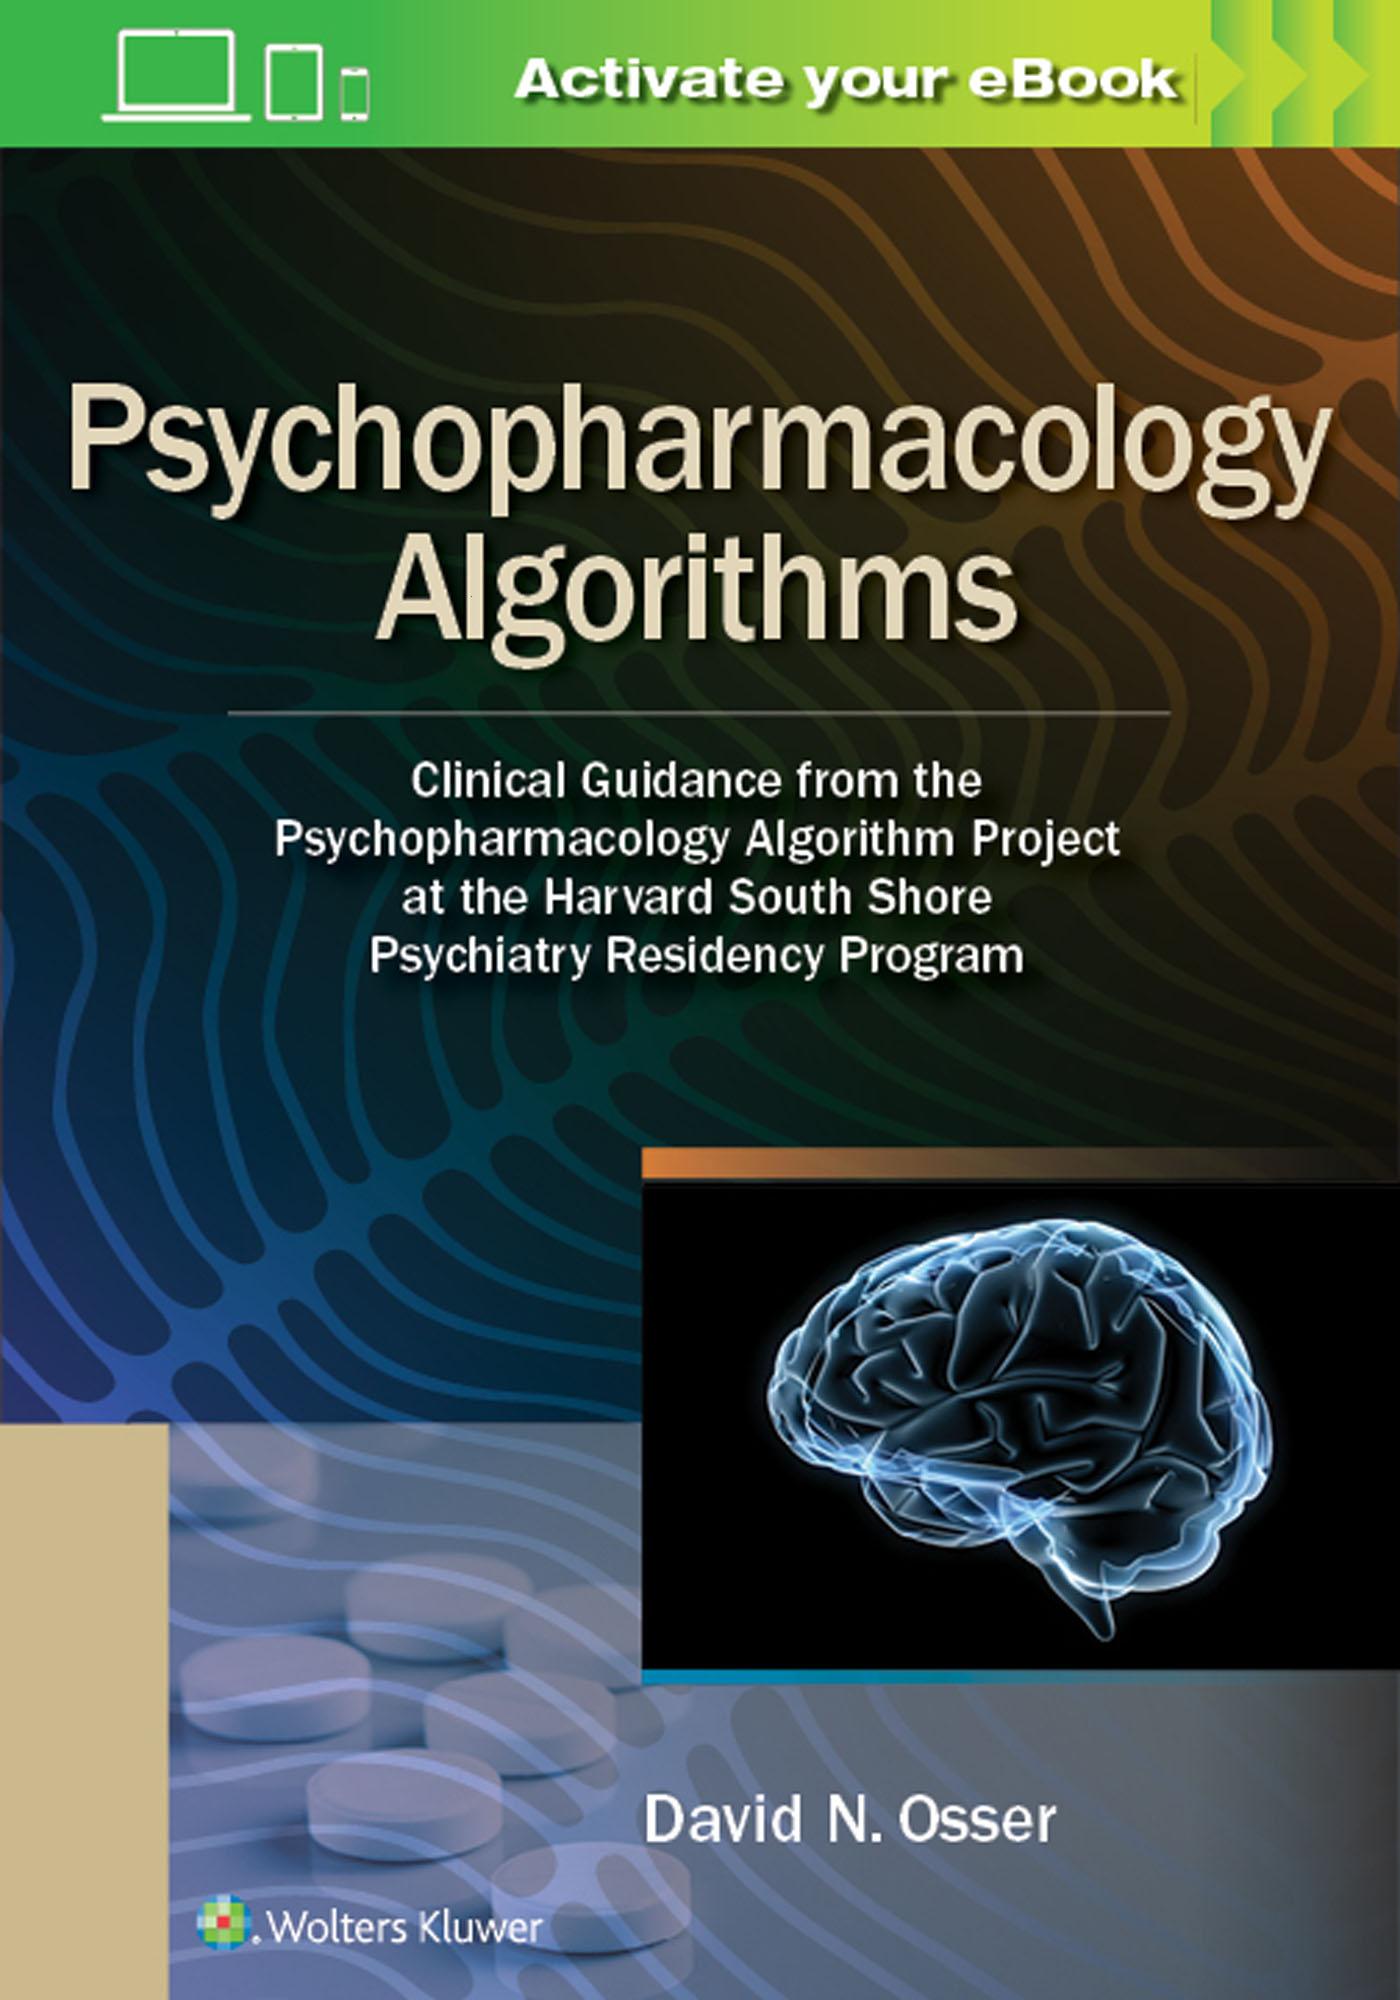 [PDF] [EPUB] Psychopharmacology Algorithms: Clinical Guidance from the Psychopharmacology Algorithm Project at the Harvard South Shore Psychiatry Residency Program Download by David Osser